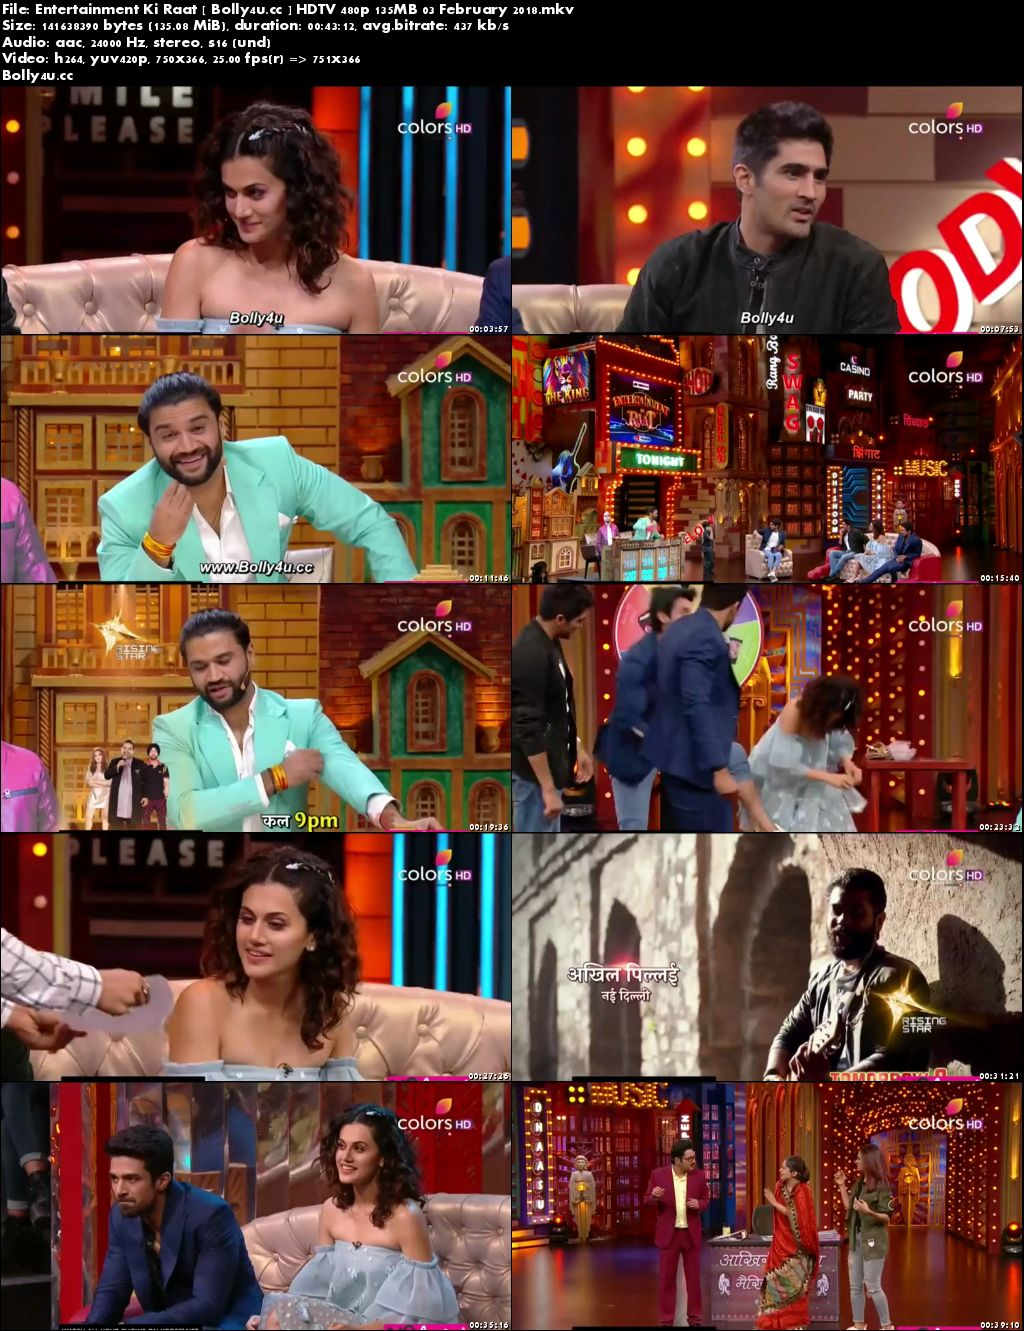 Entertainment Ki Raat HDTV 480p 130MB 03 February 2018 Download